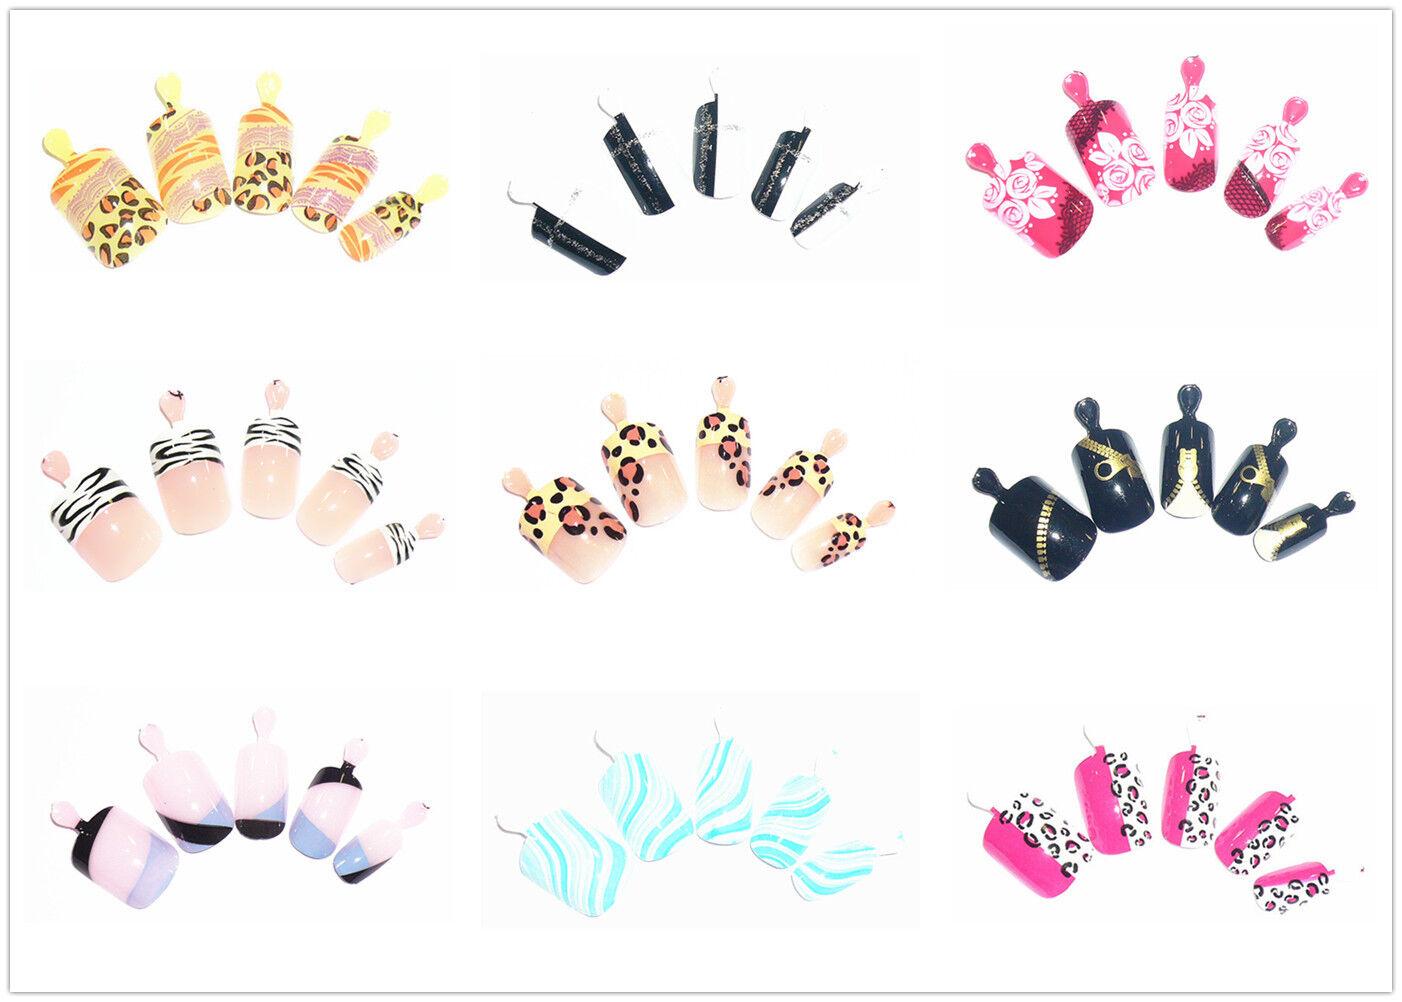 12 selbstklebende Airbrush Nails Kunstnägel Nägeln Pre-Glued French FL-01 Set